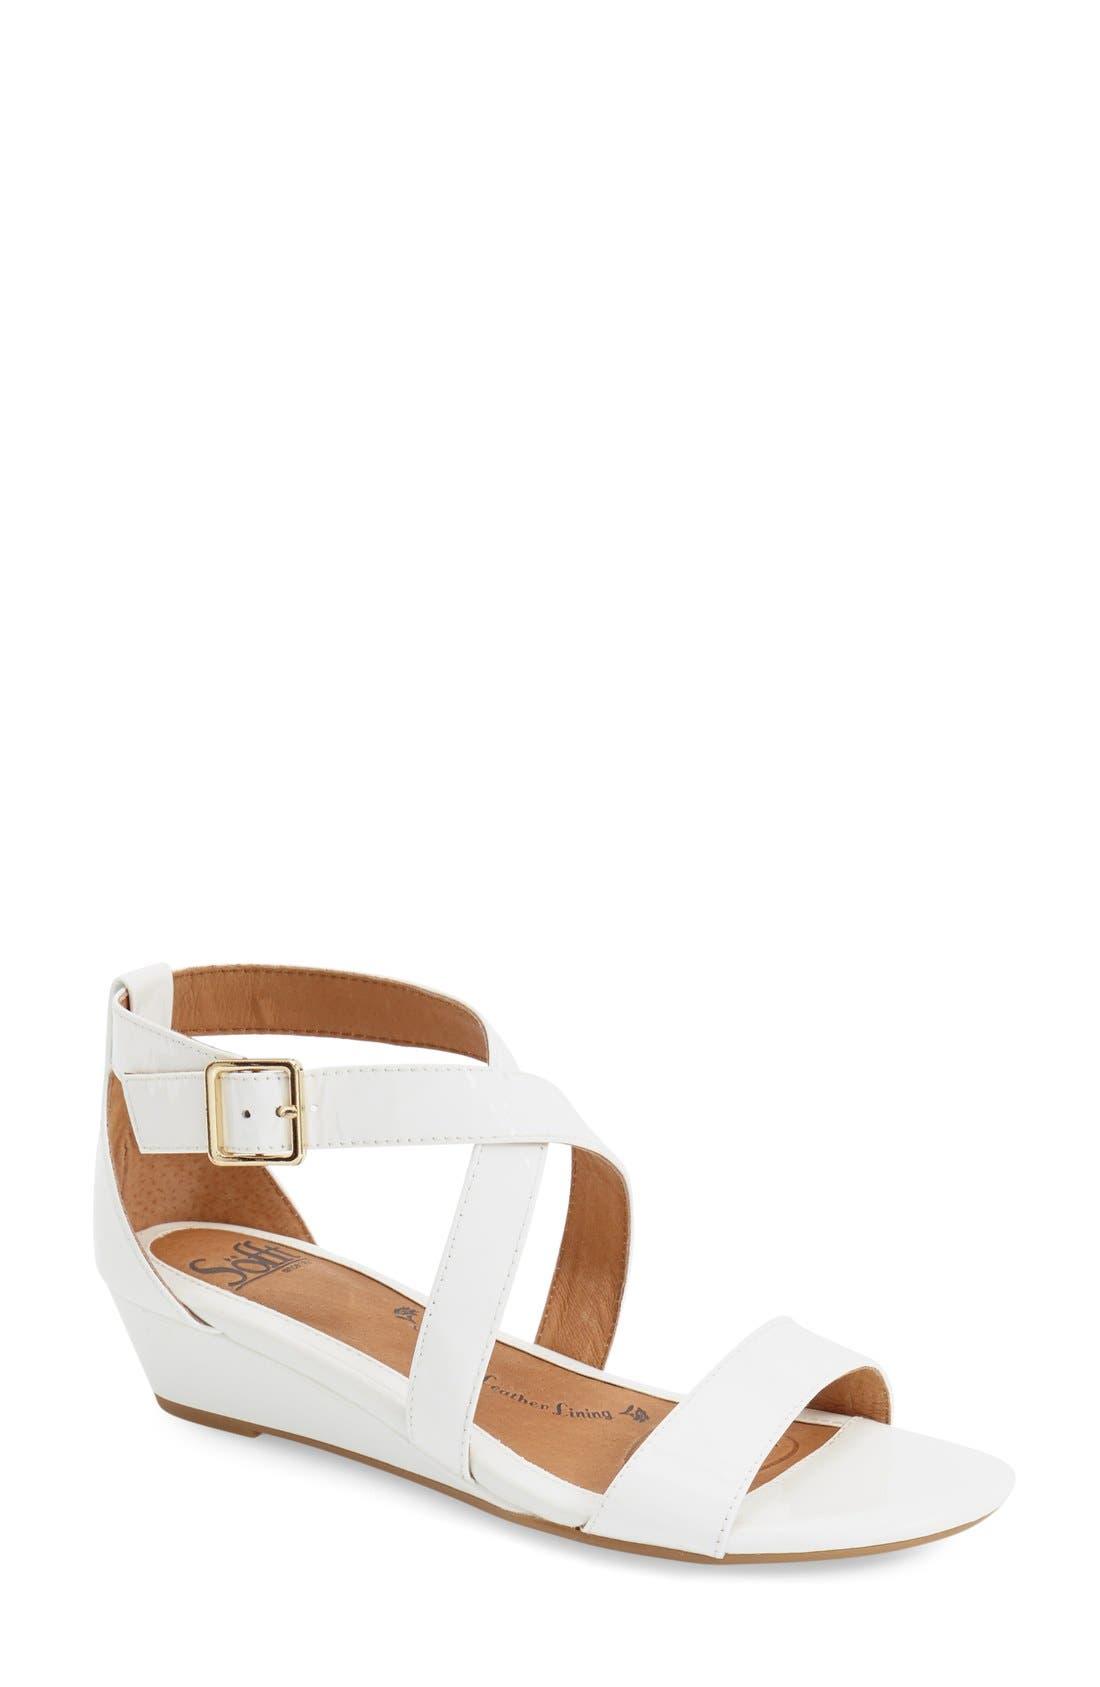 'Innis' Low Wedge Sandal,                             Main thumbnail 7, color,